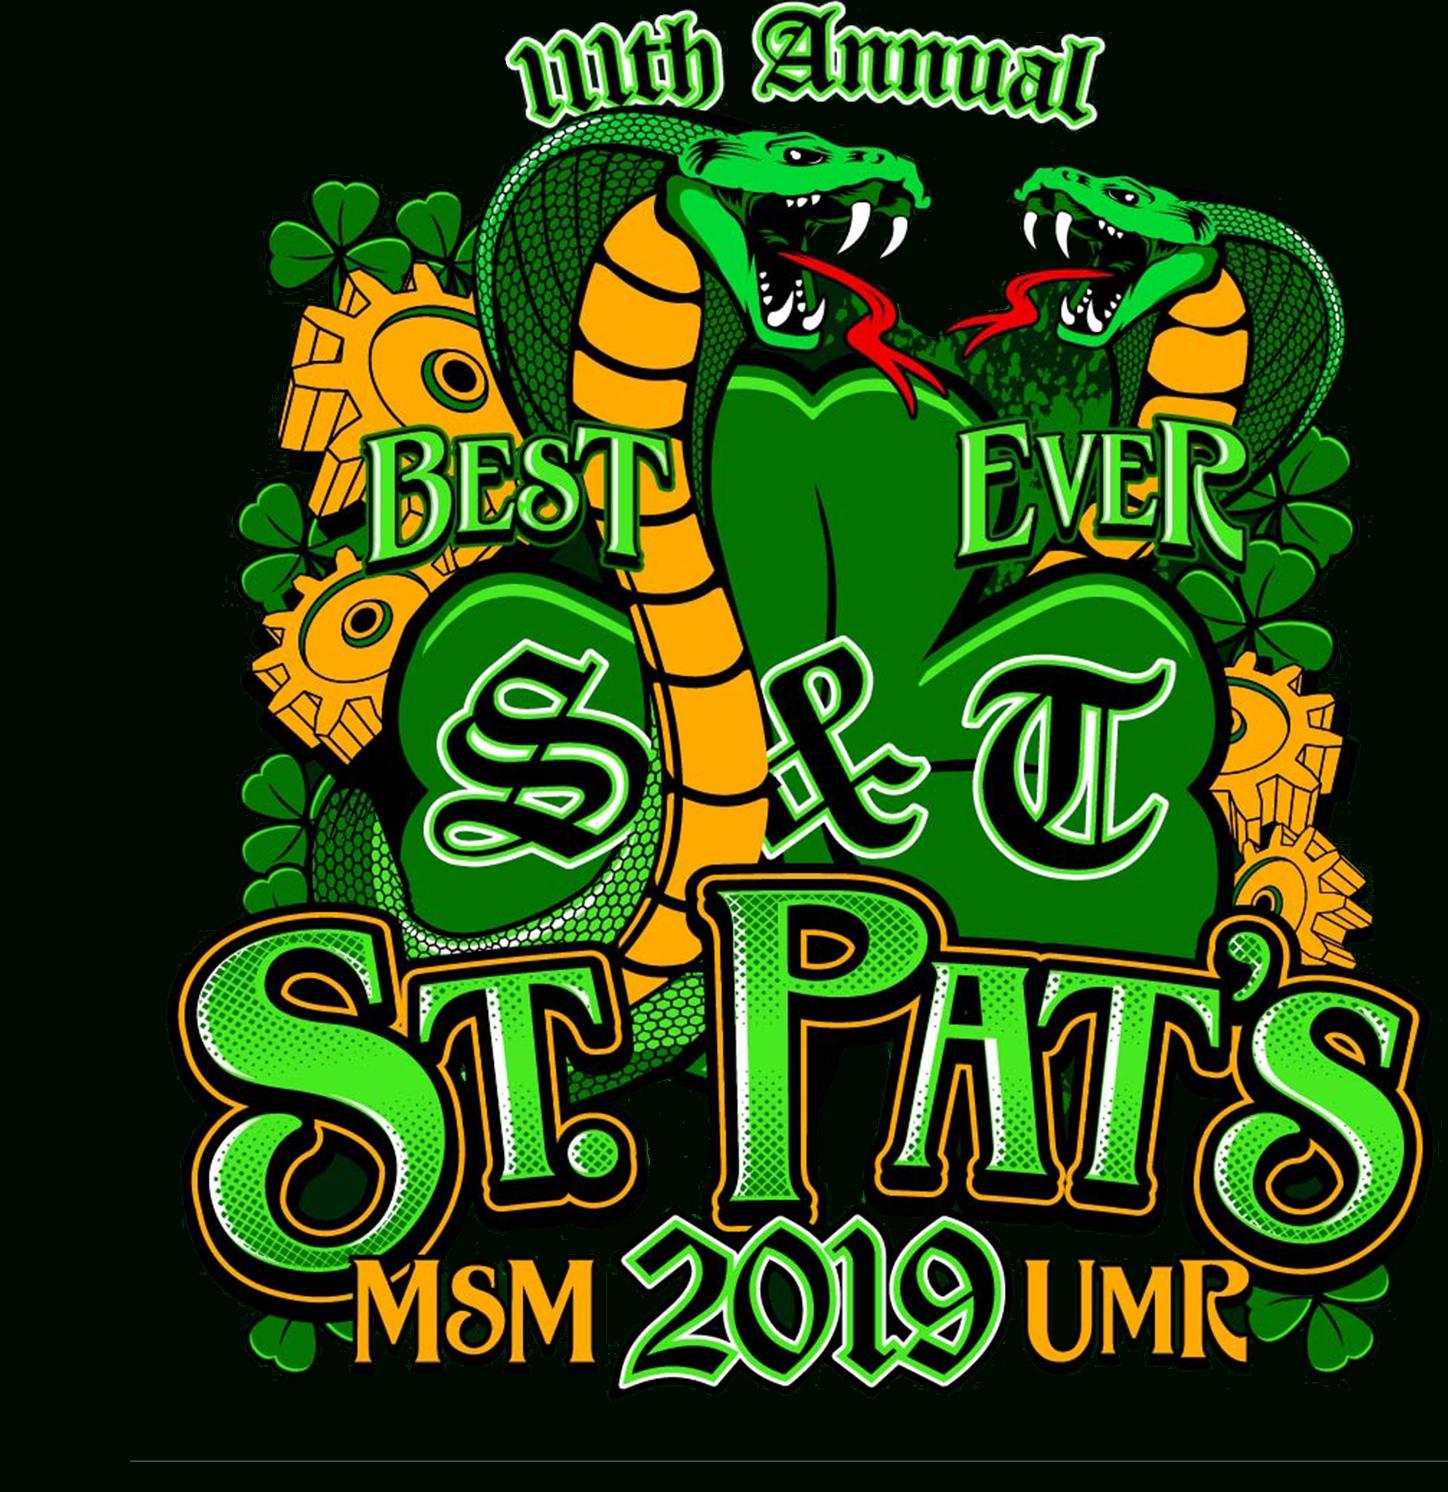 St. Pat's Missouri S&t Calendar 2019